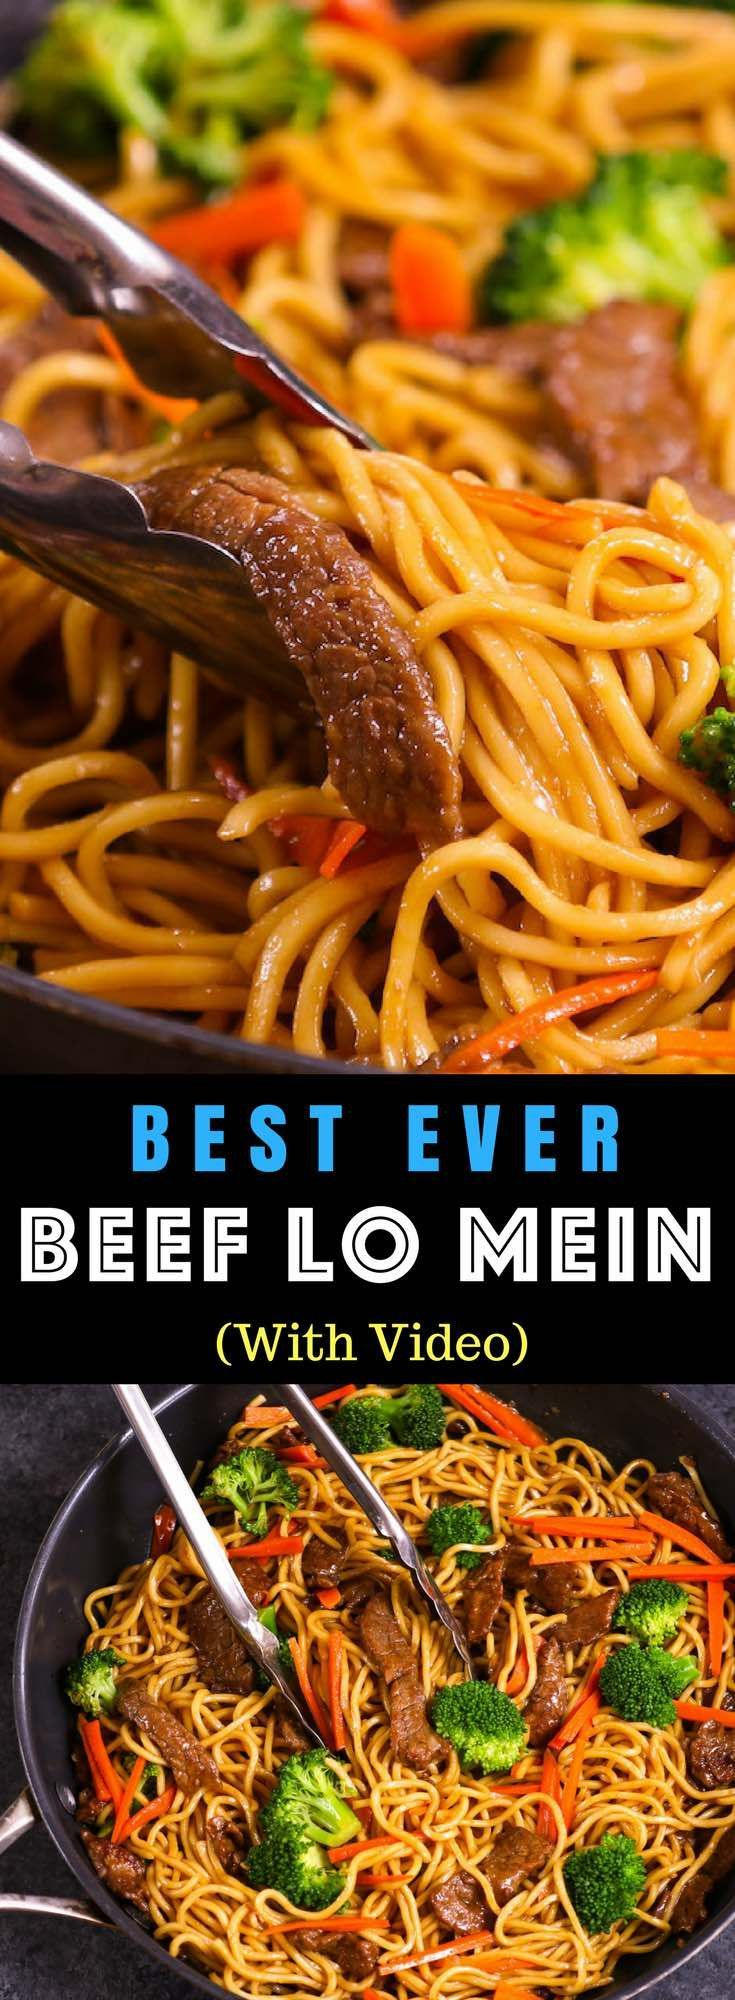 Garlic Beef Lo Mein Recipe - TipBuzz